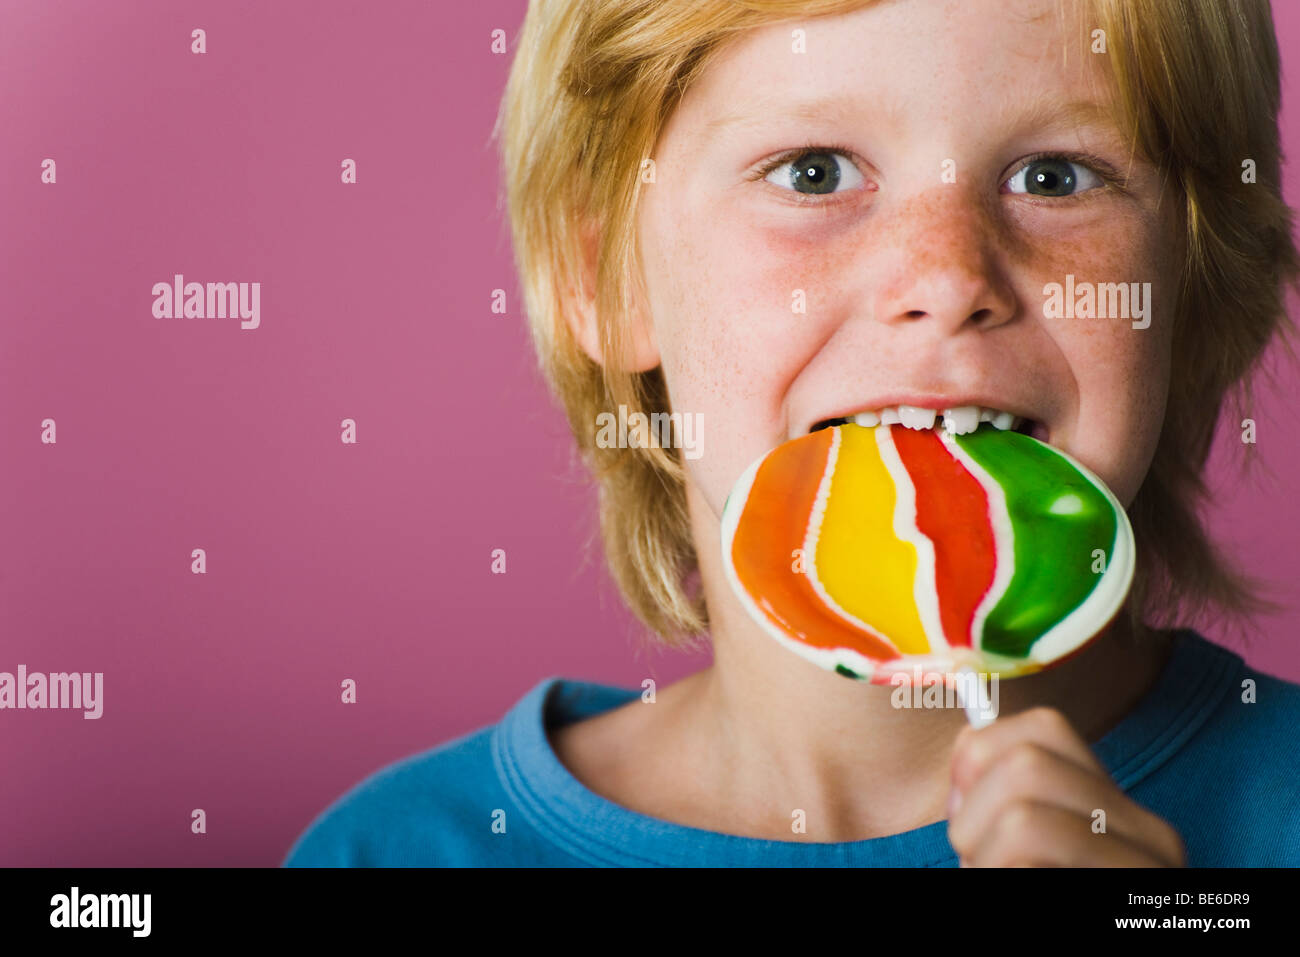 Boy eating lollipop, portrait - Stock Image